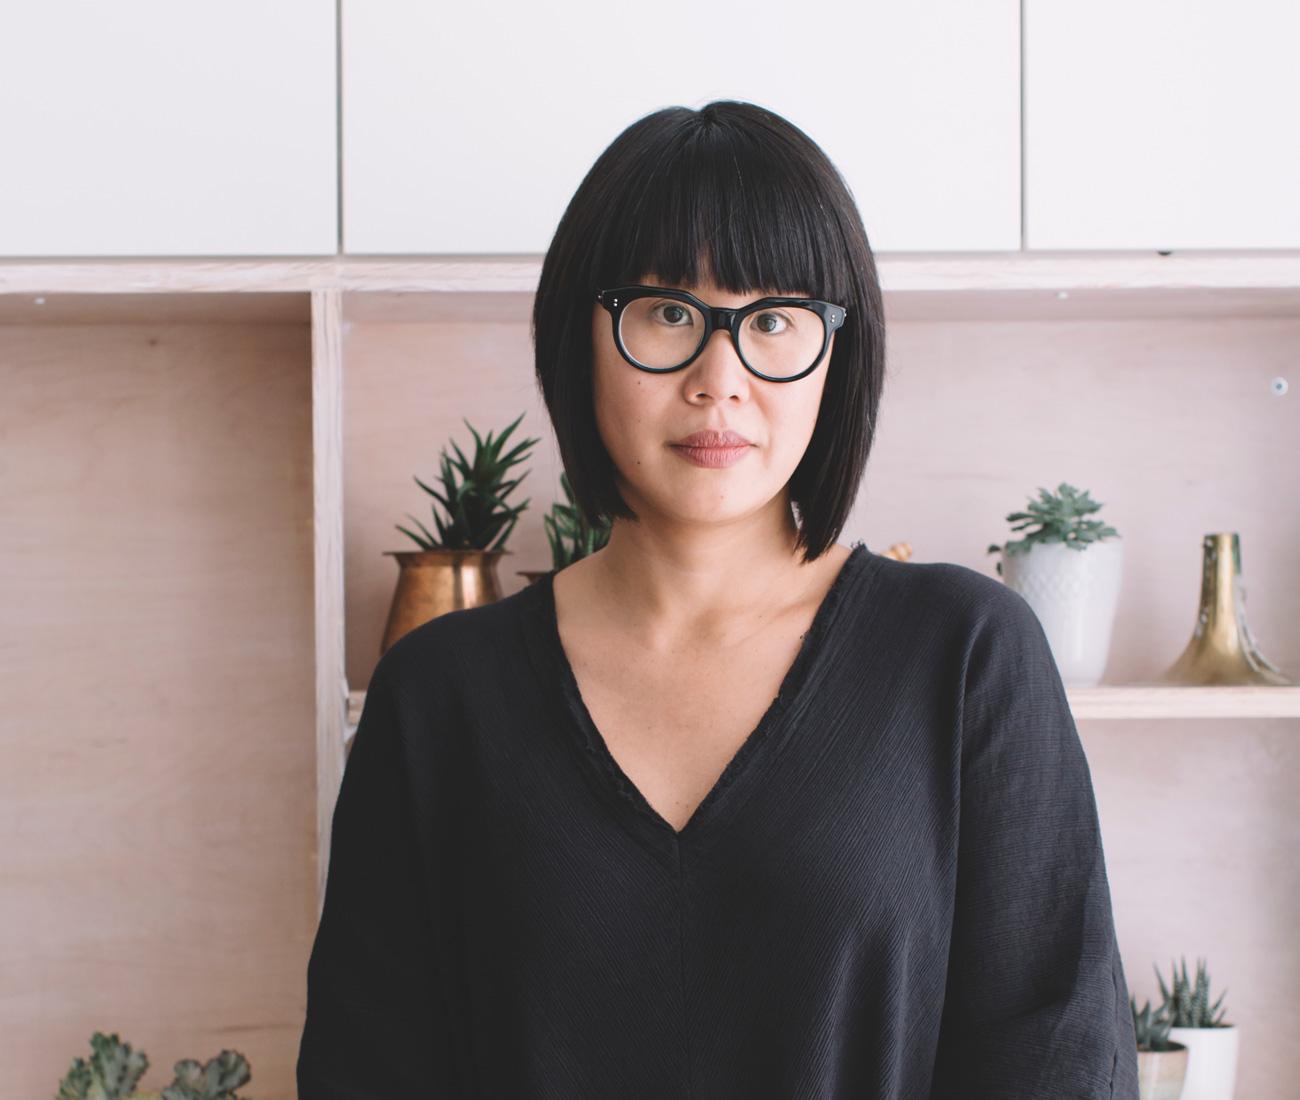 Deborah Wang - Stow Collaboration for Change